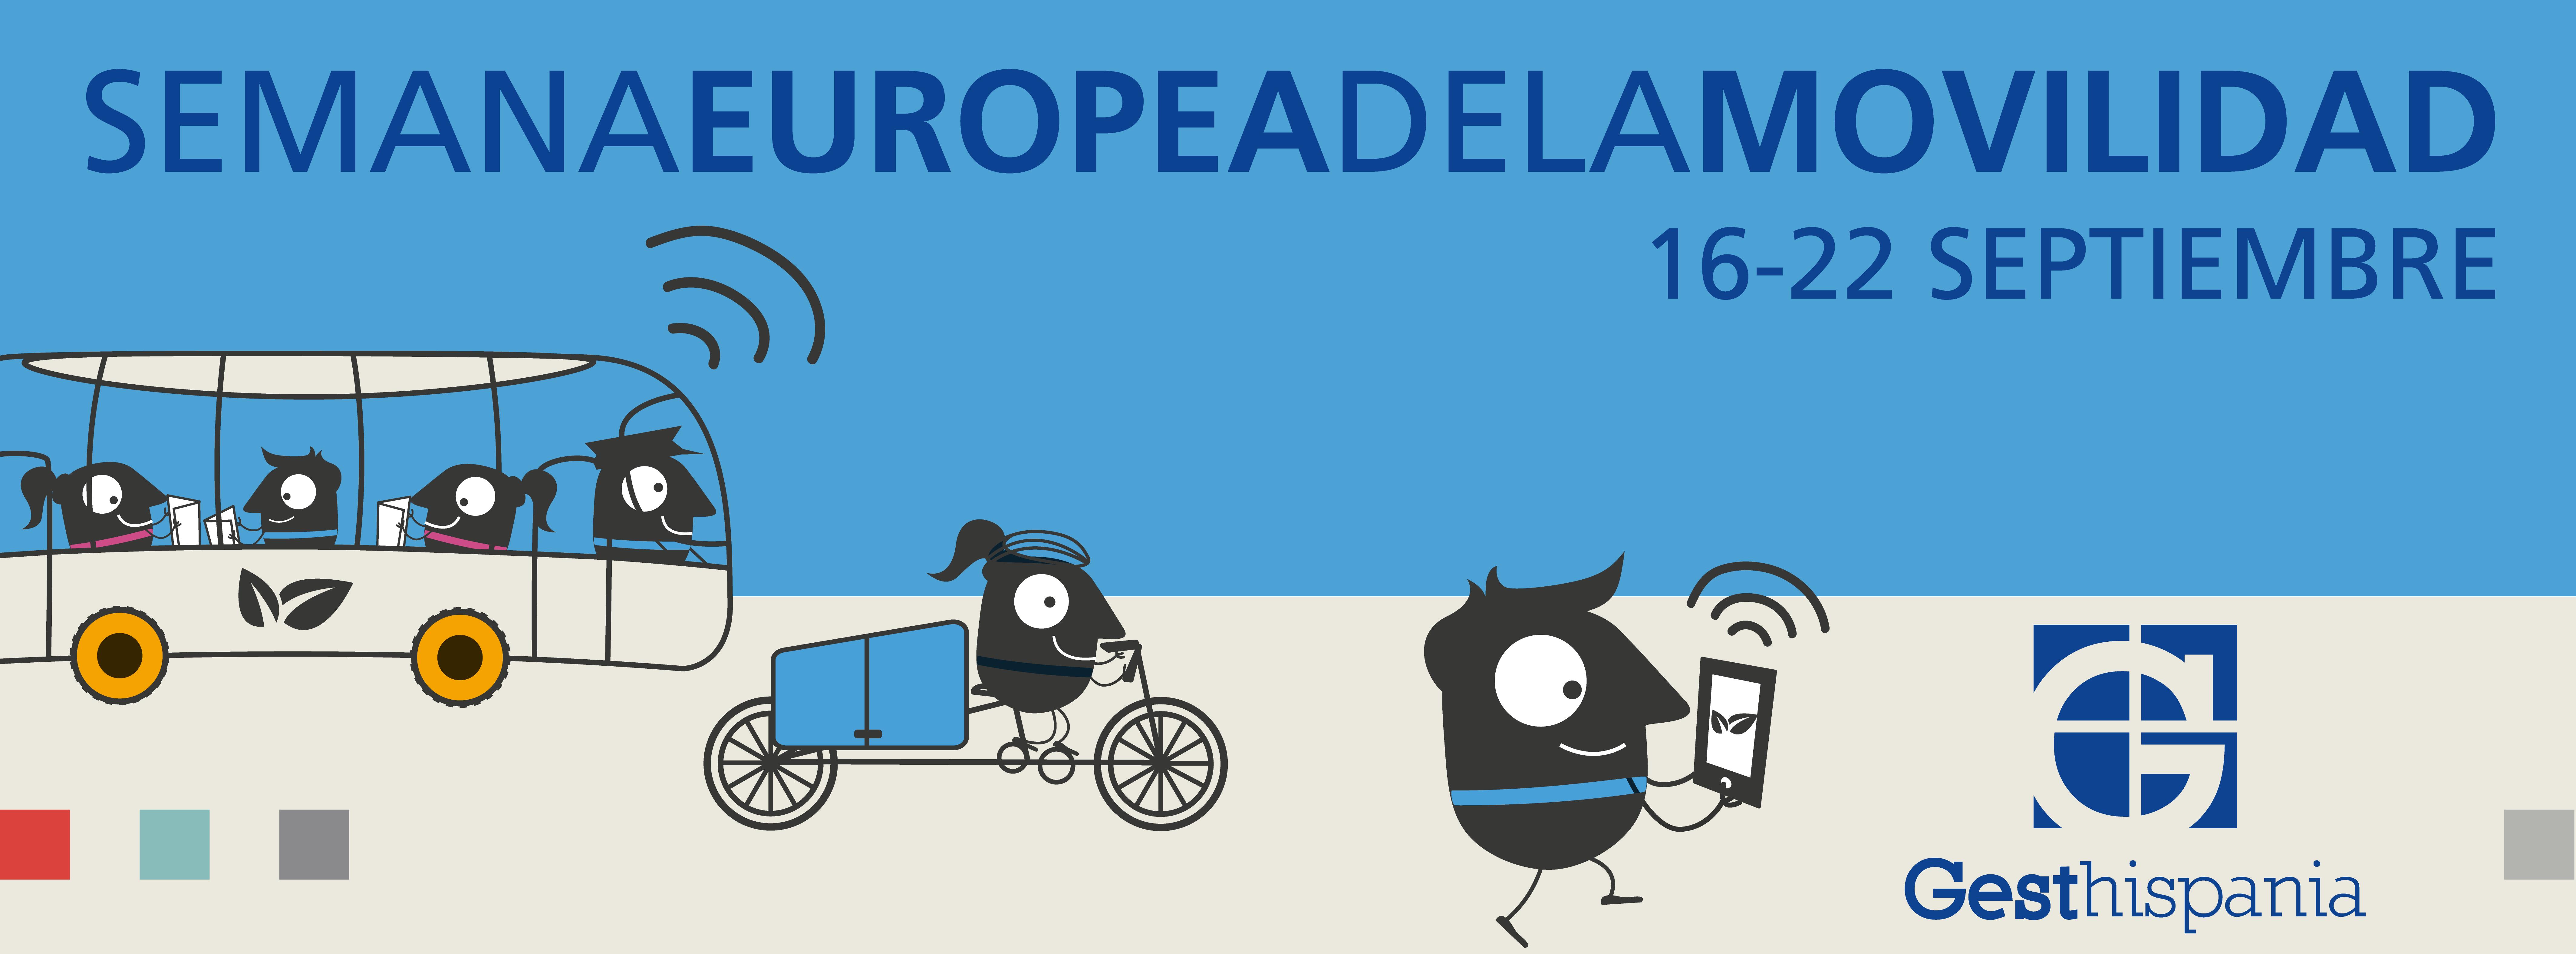 Gesthispania - Semana Europea Movilidad